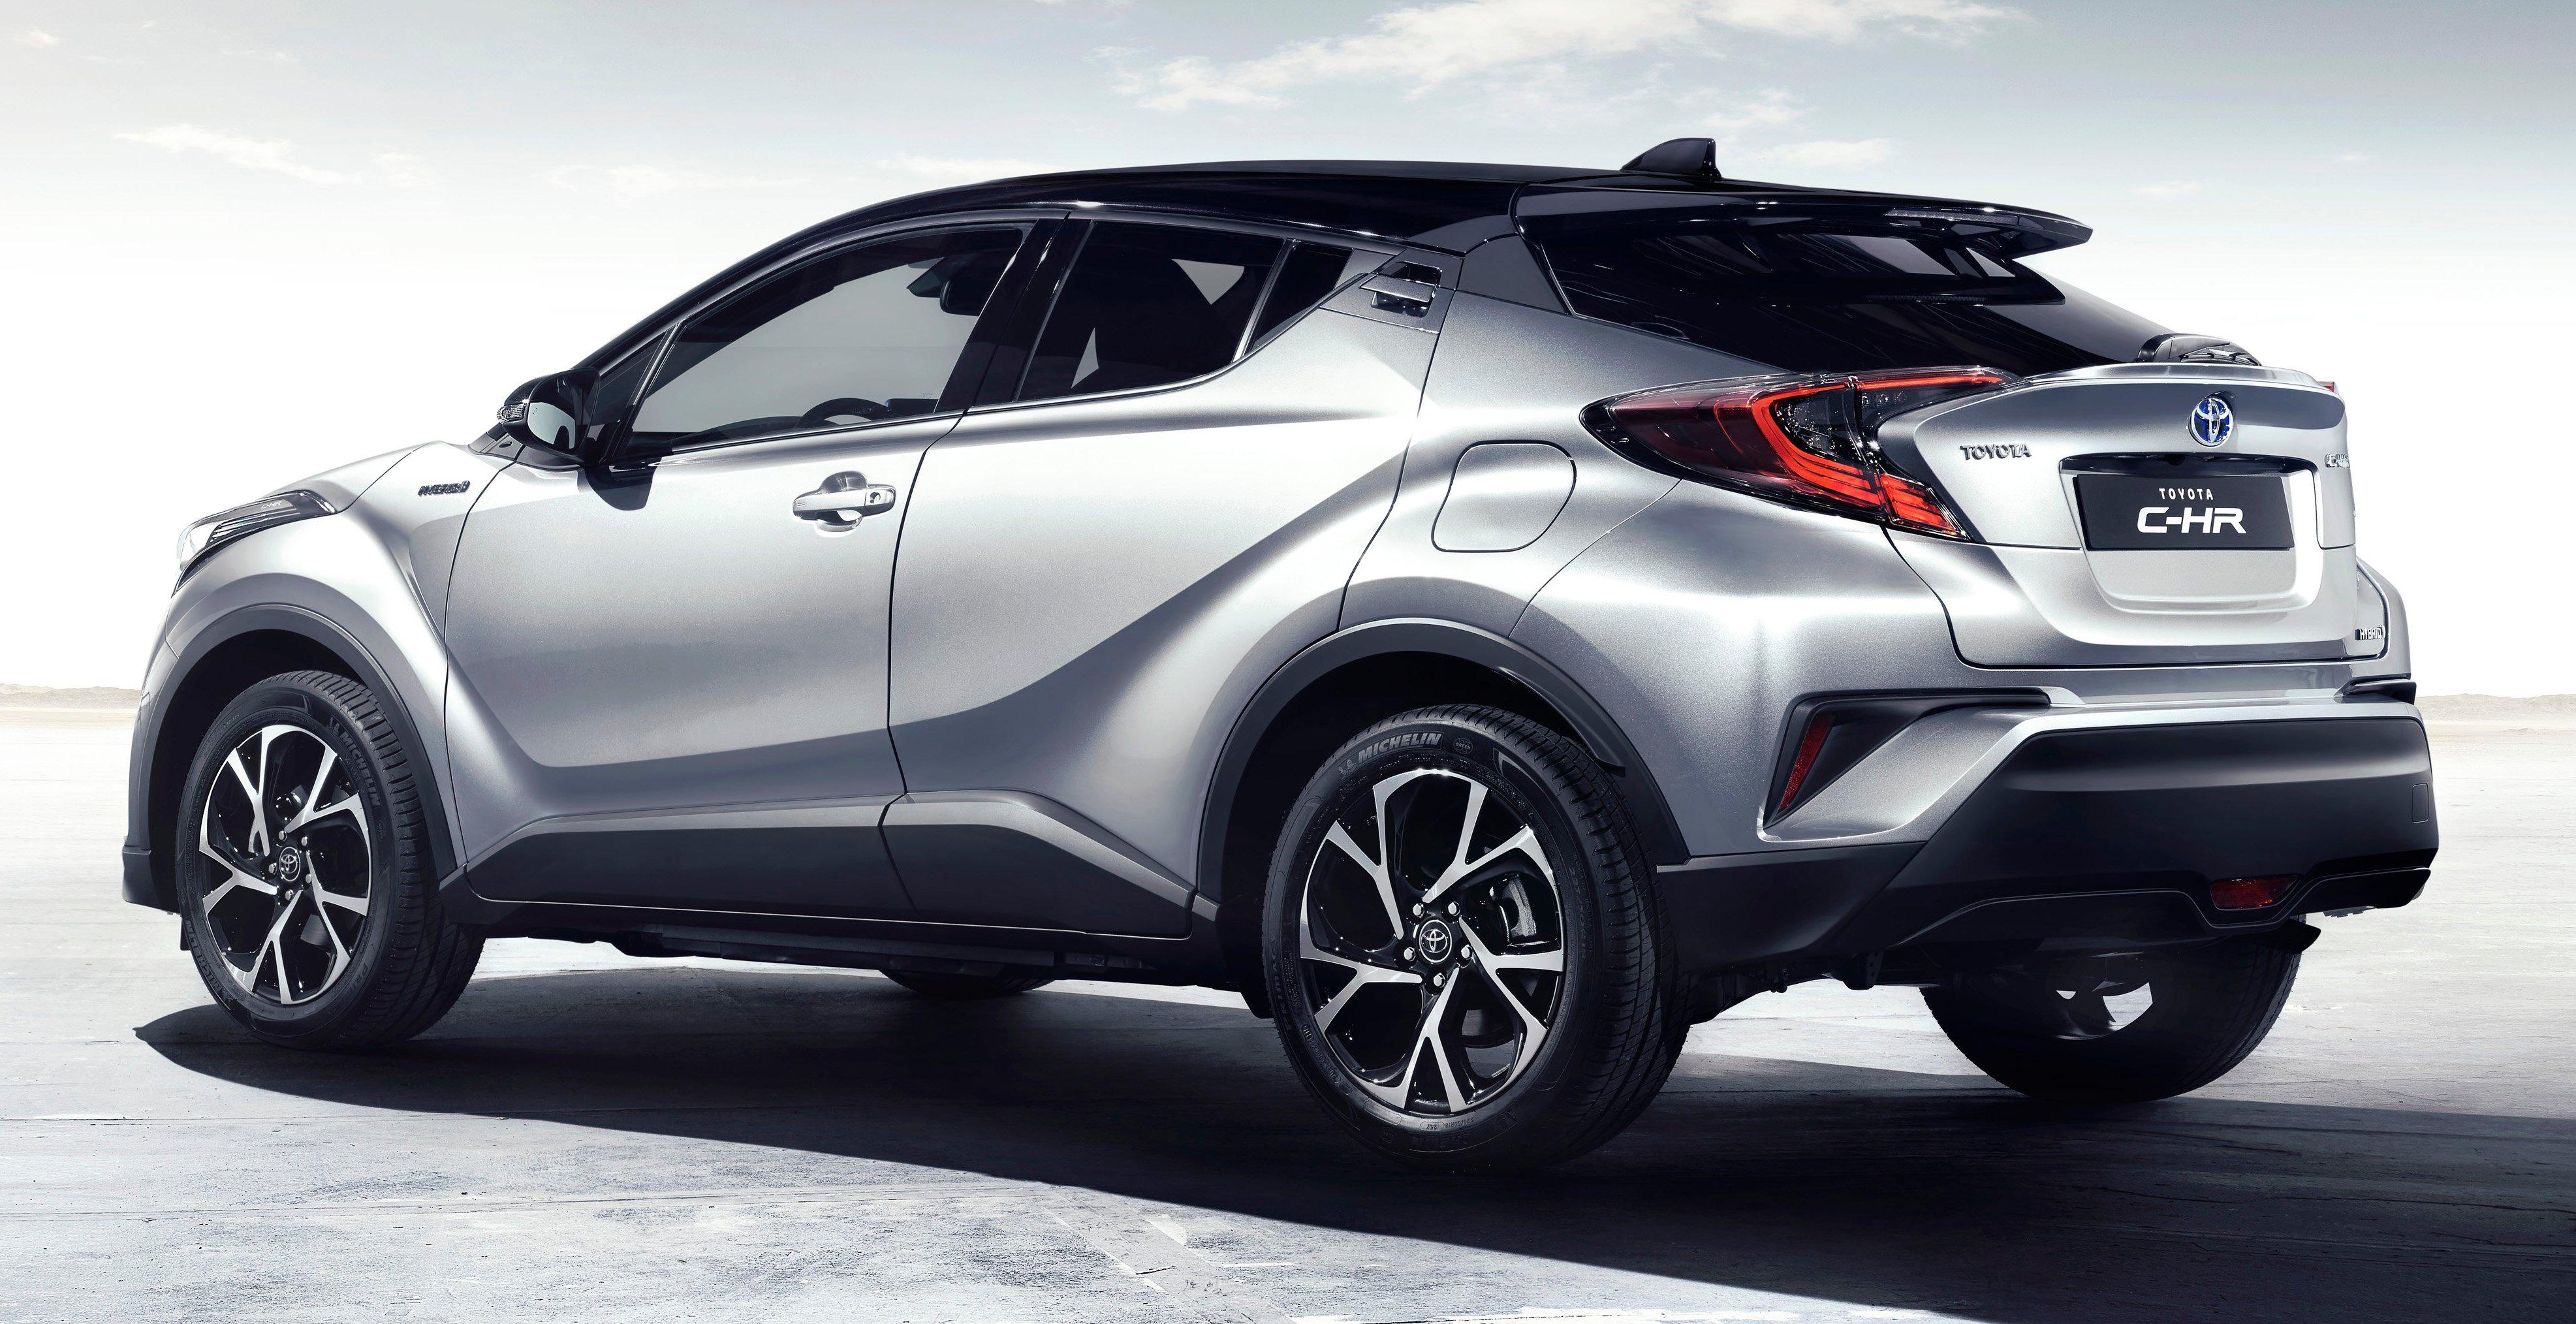 2017 Toyota C-HR – production SUV's interior revealed